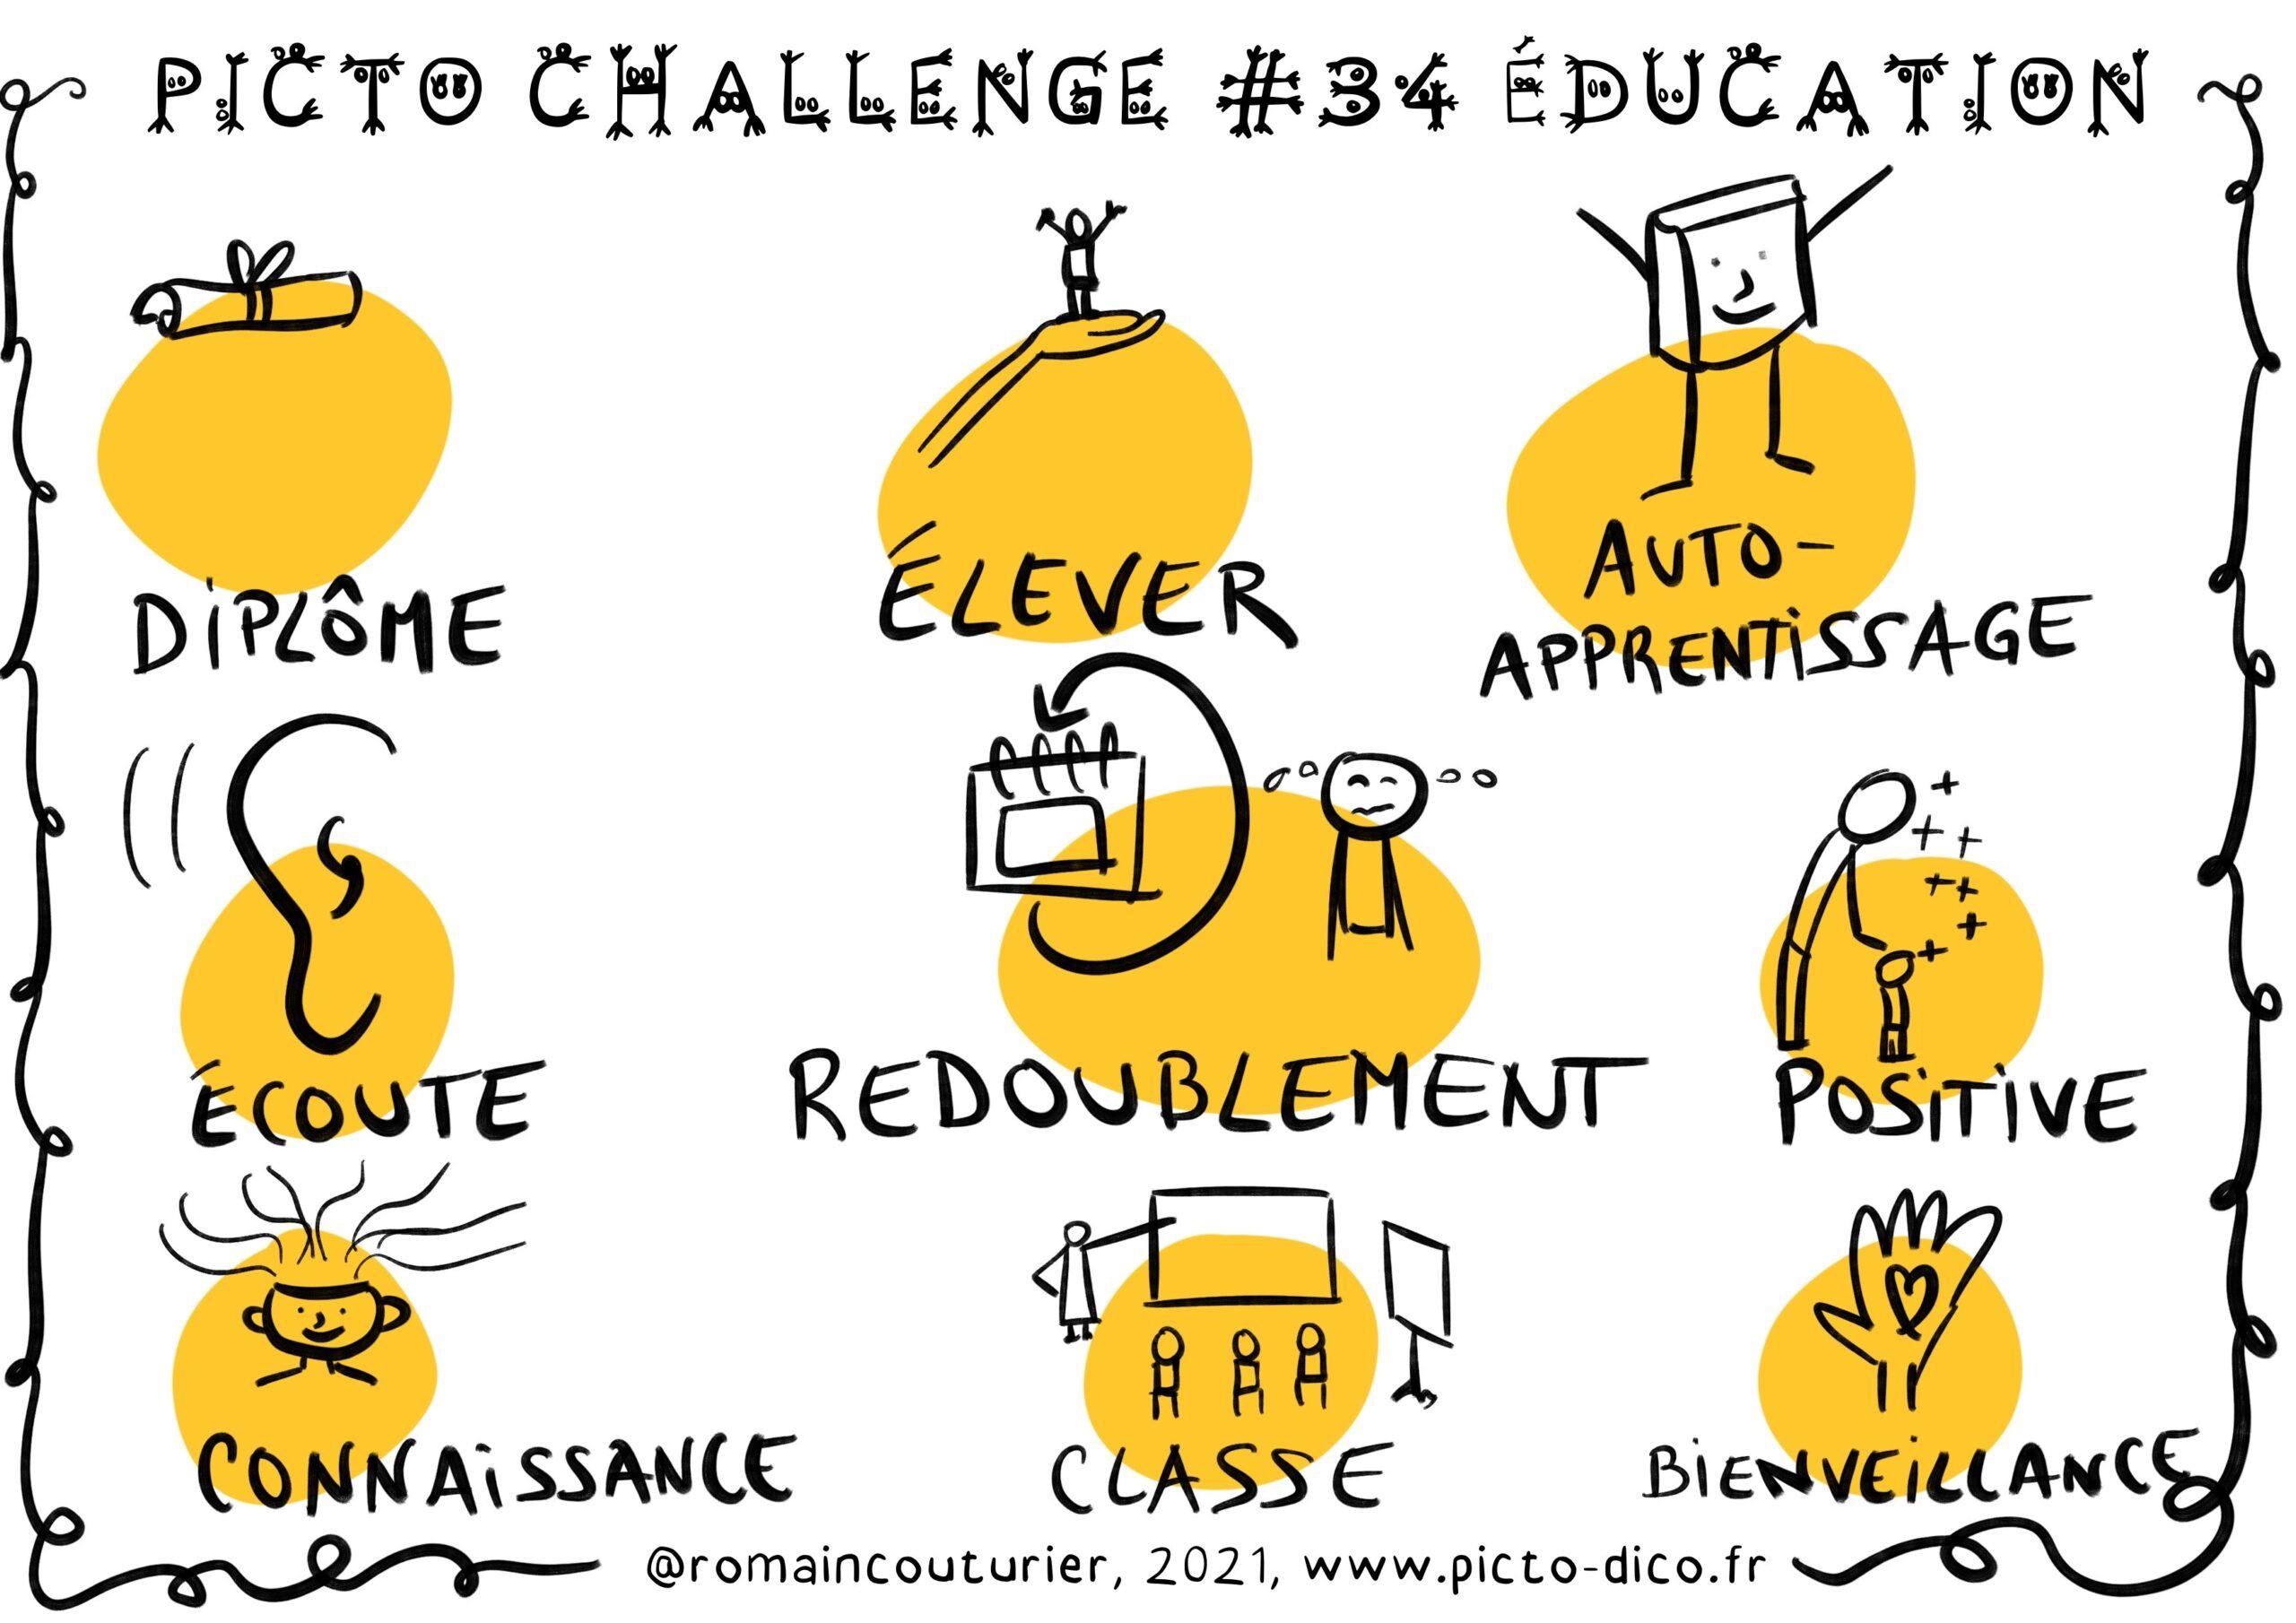 PictoChallenge n°34 spécial Education